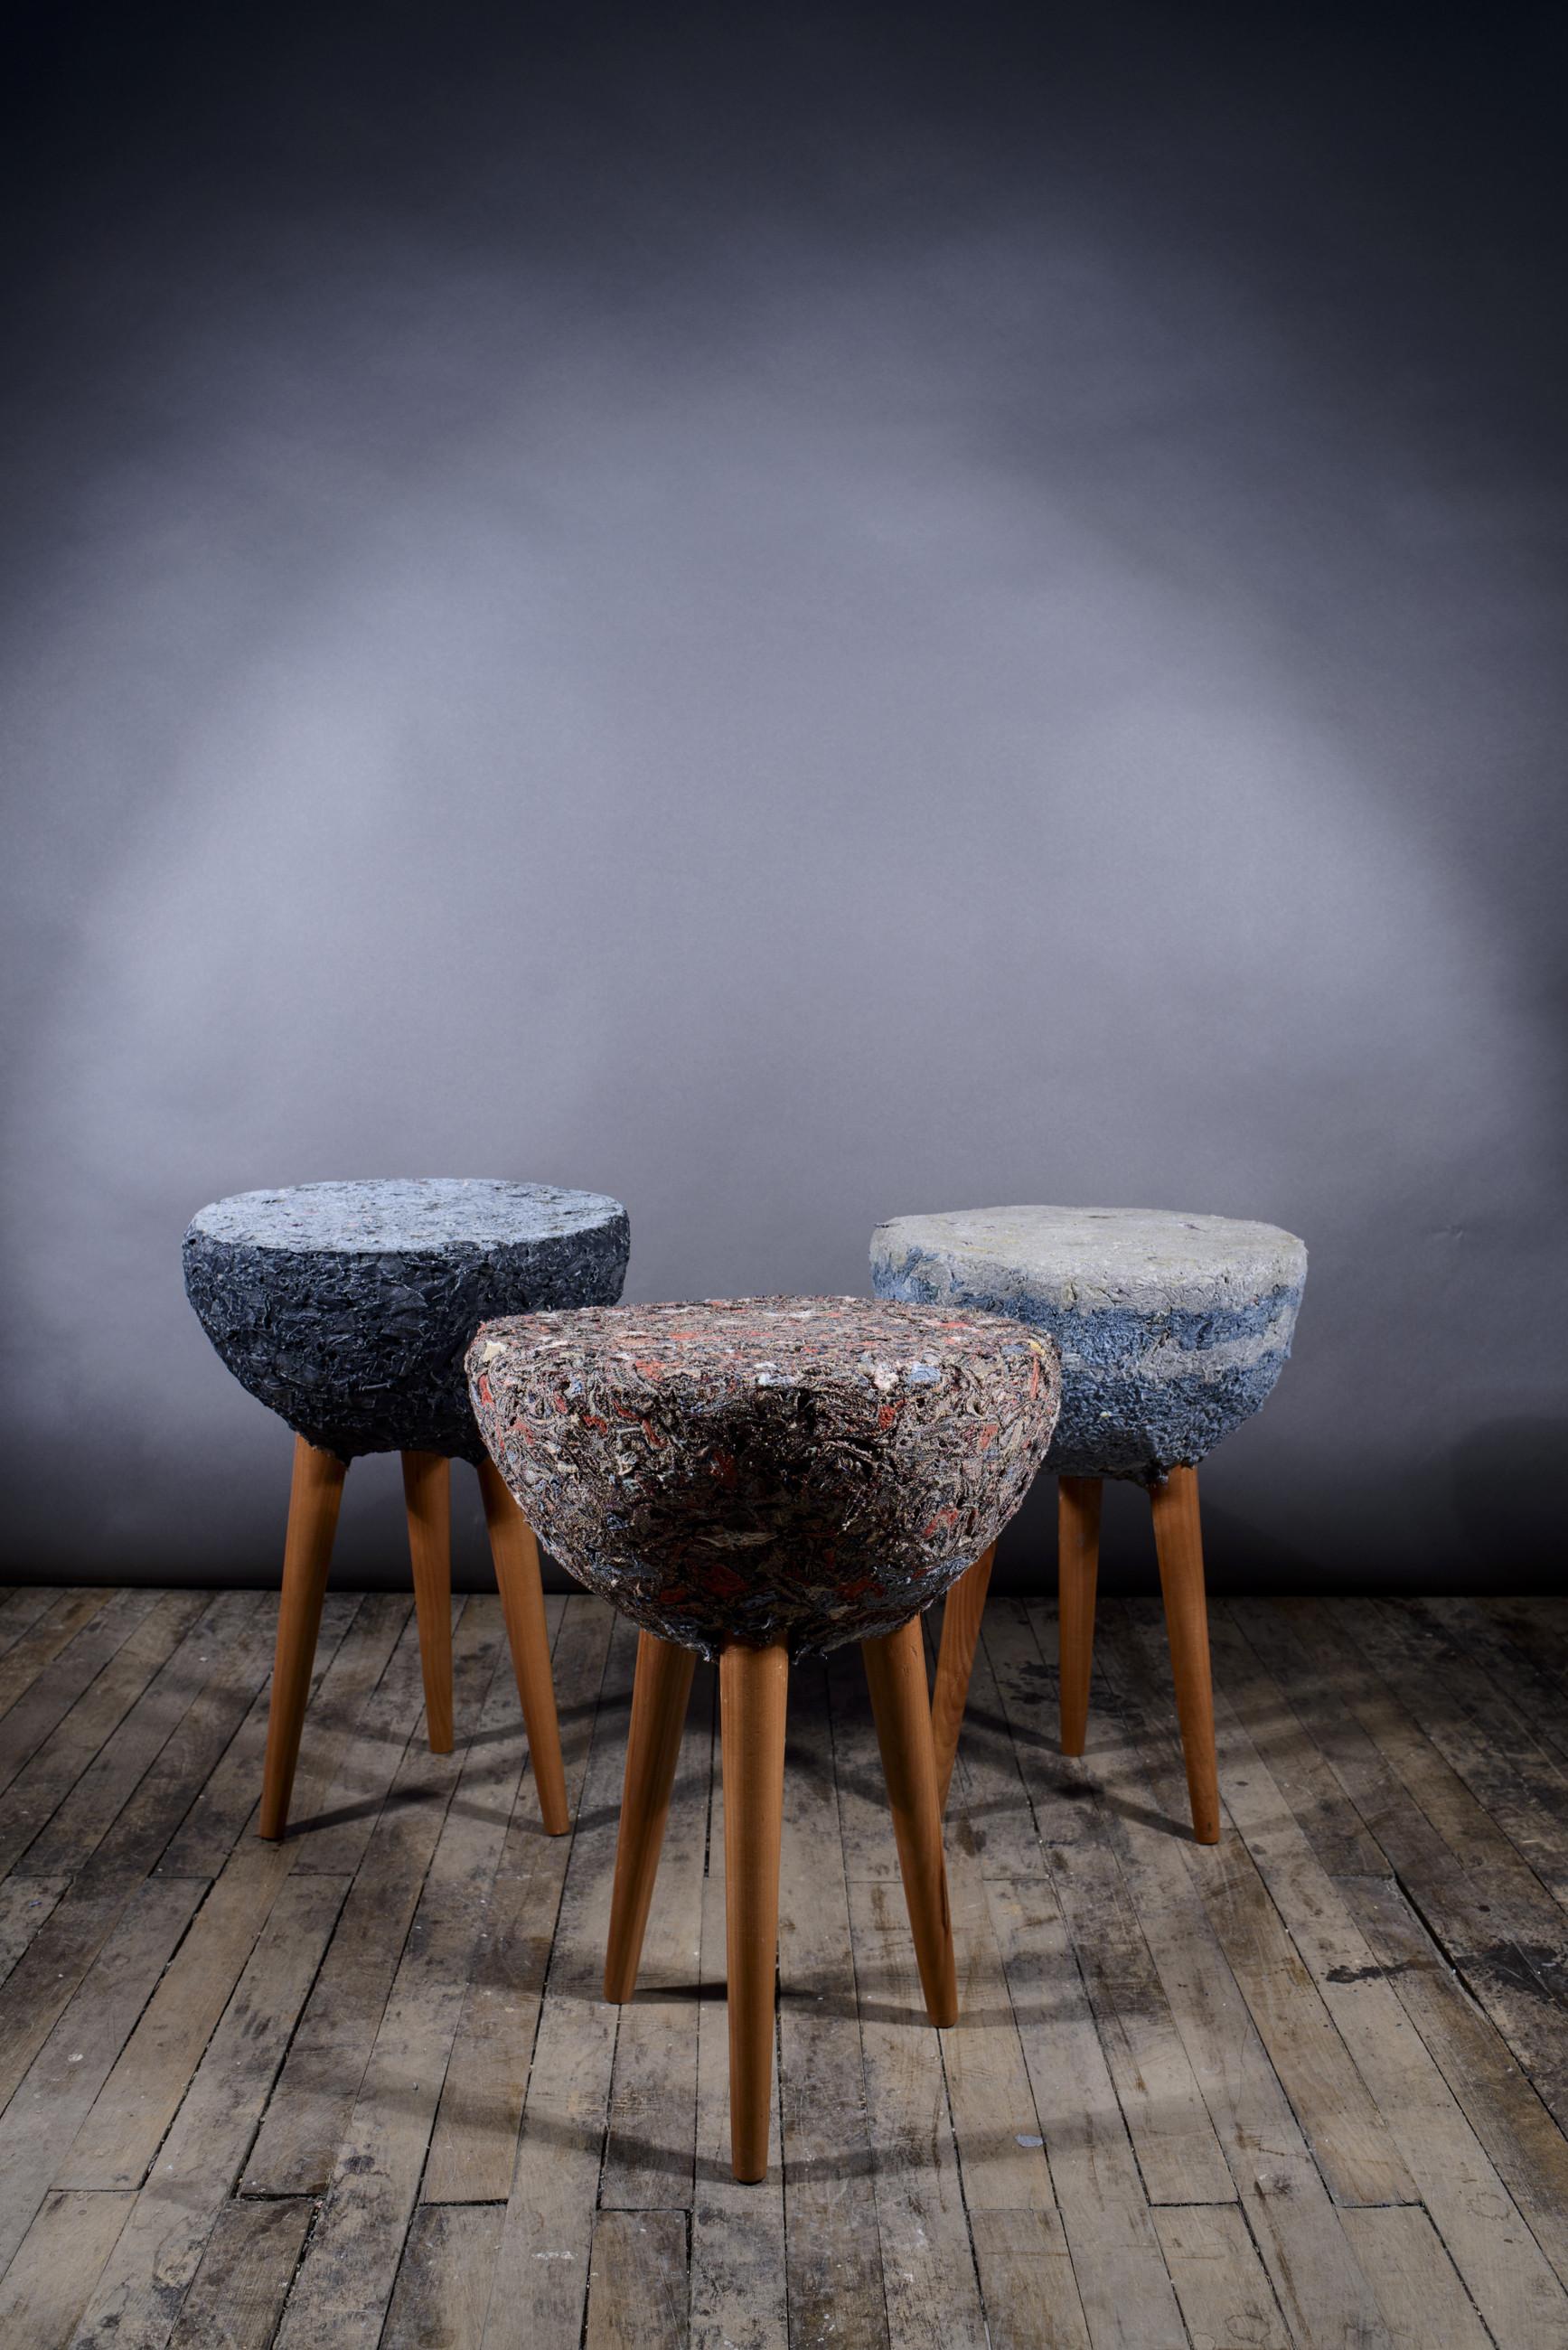 mobiliario jardim jumbo:Demodé: mobiliário textil / Bernardita Marambio Design Studio